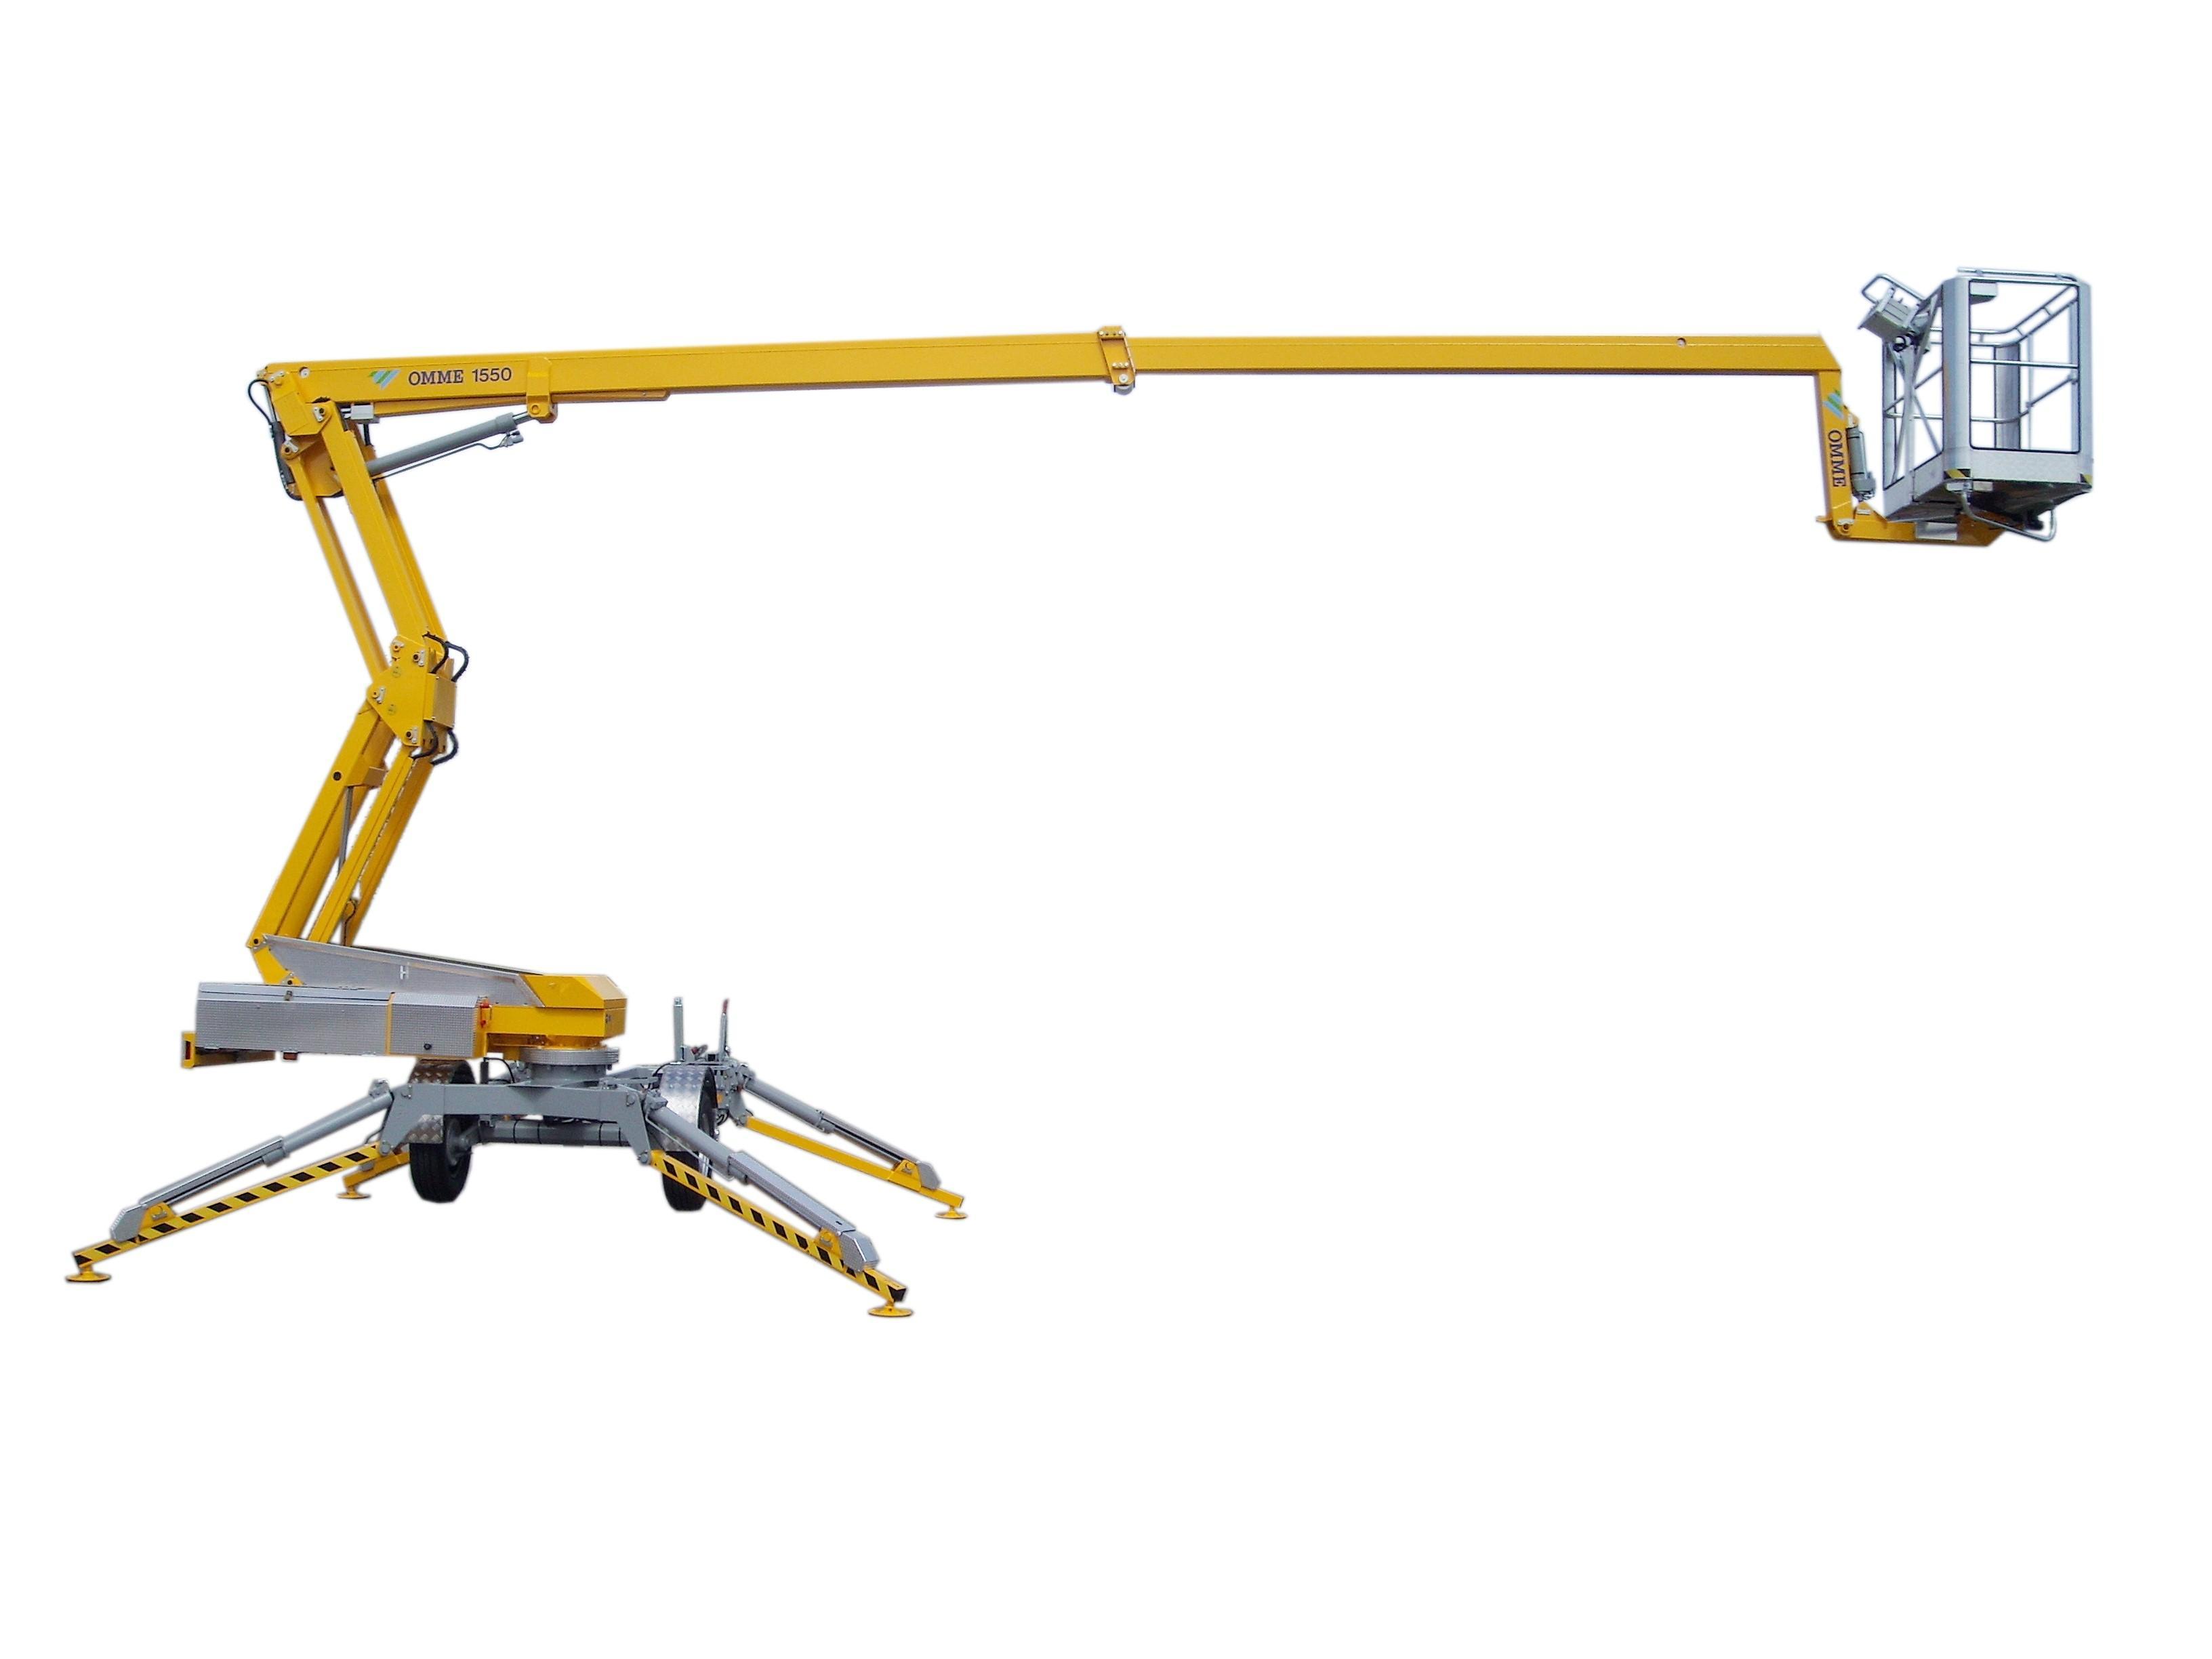 Skylift 15,5m Omme 1550 Batteri, Sax Självgående